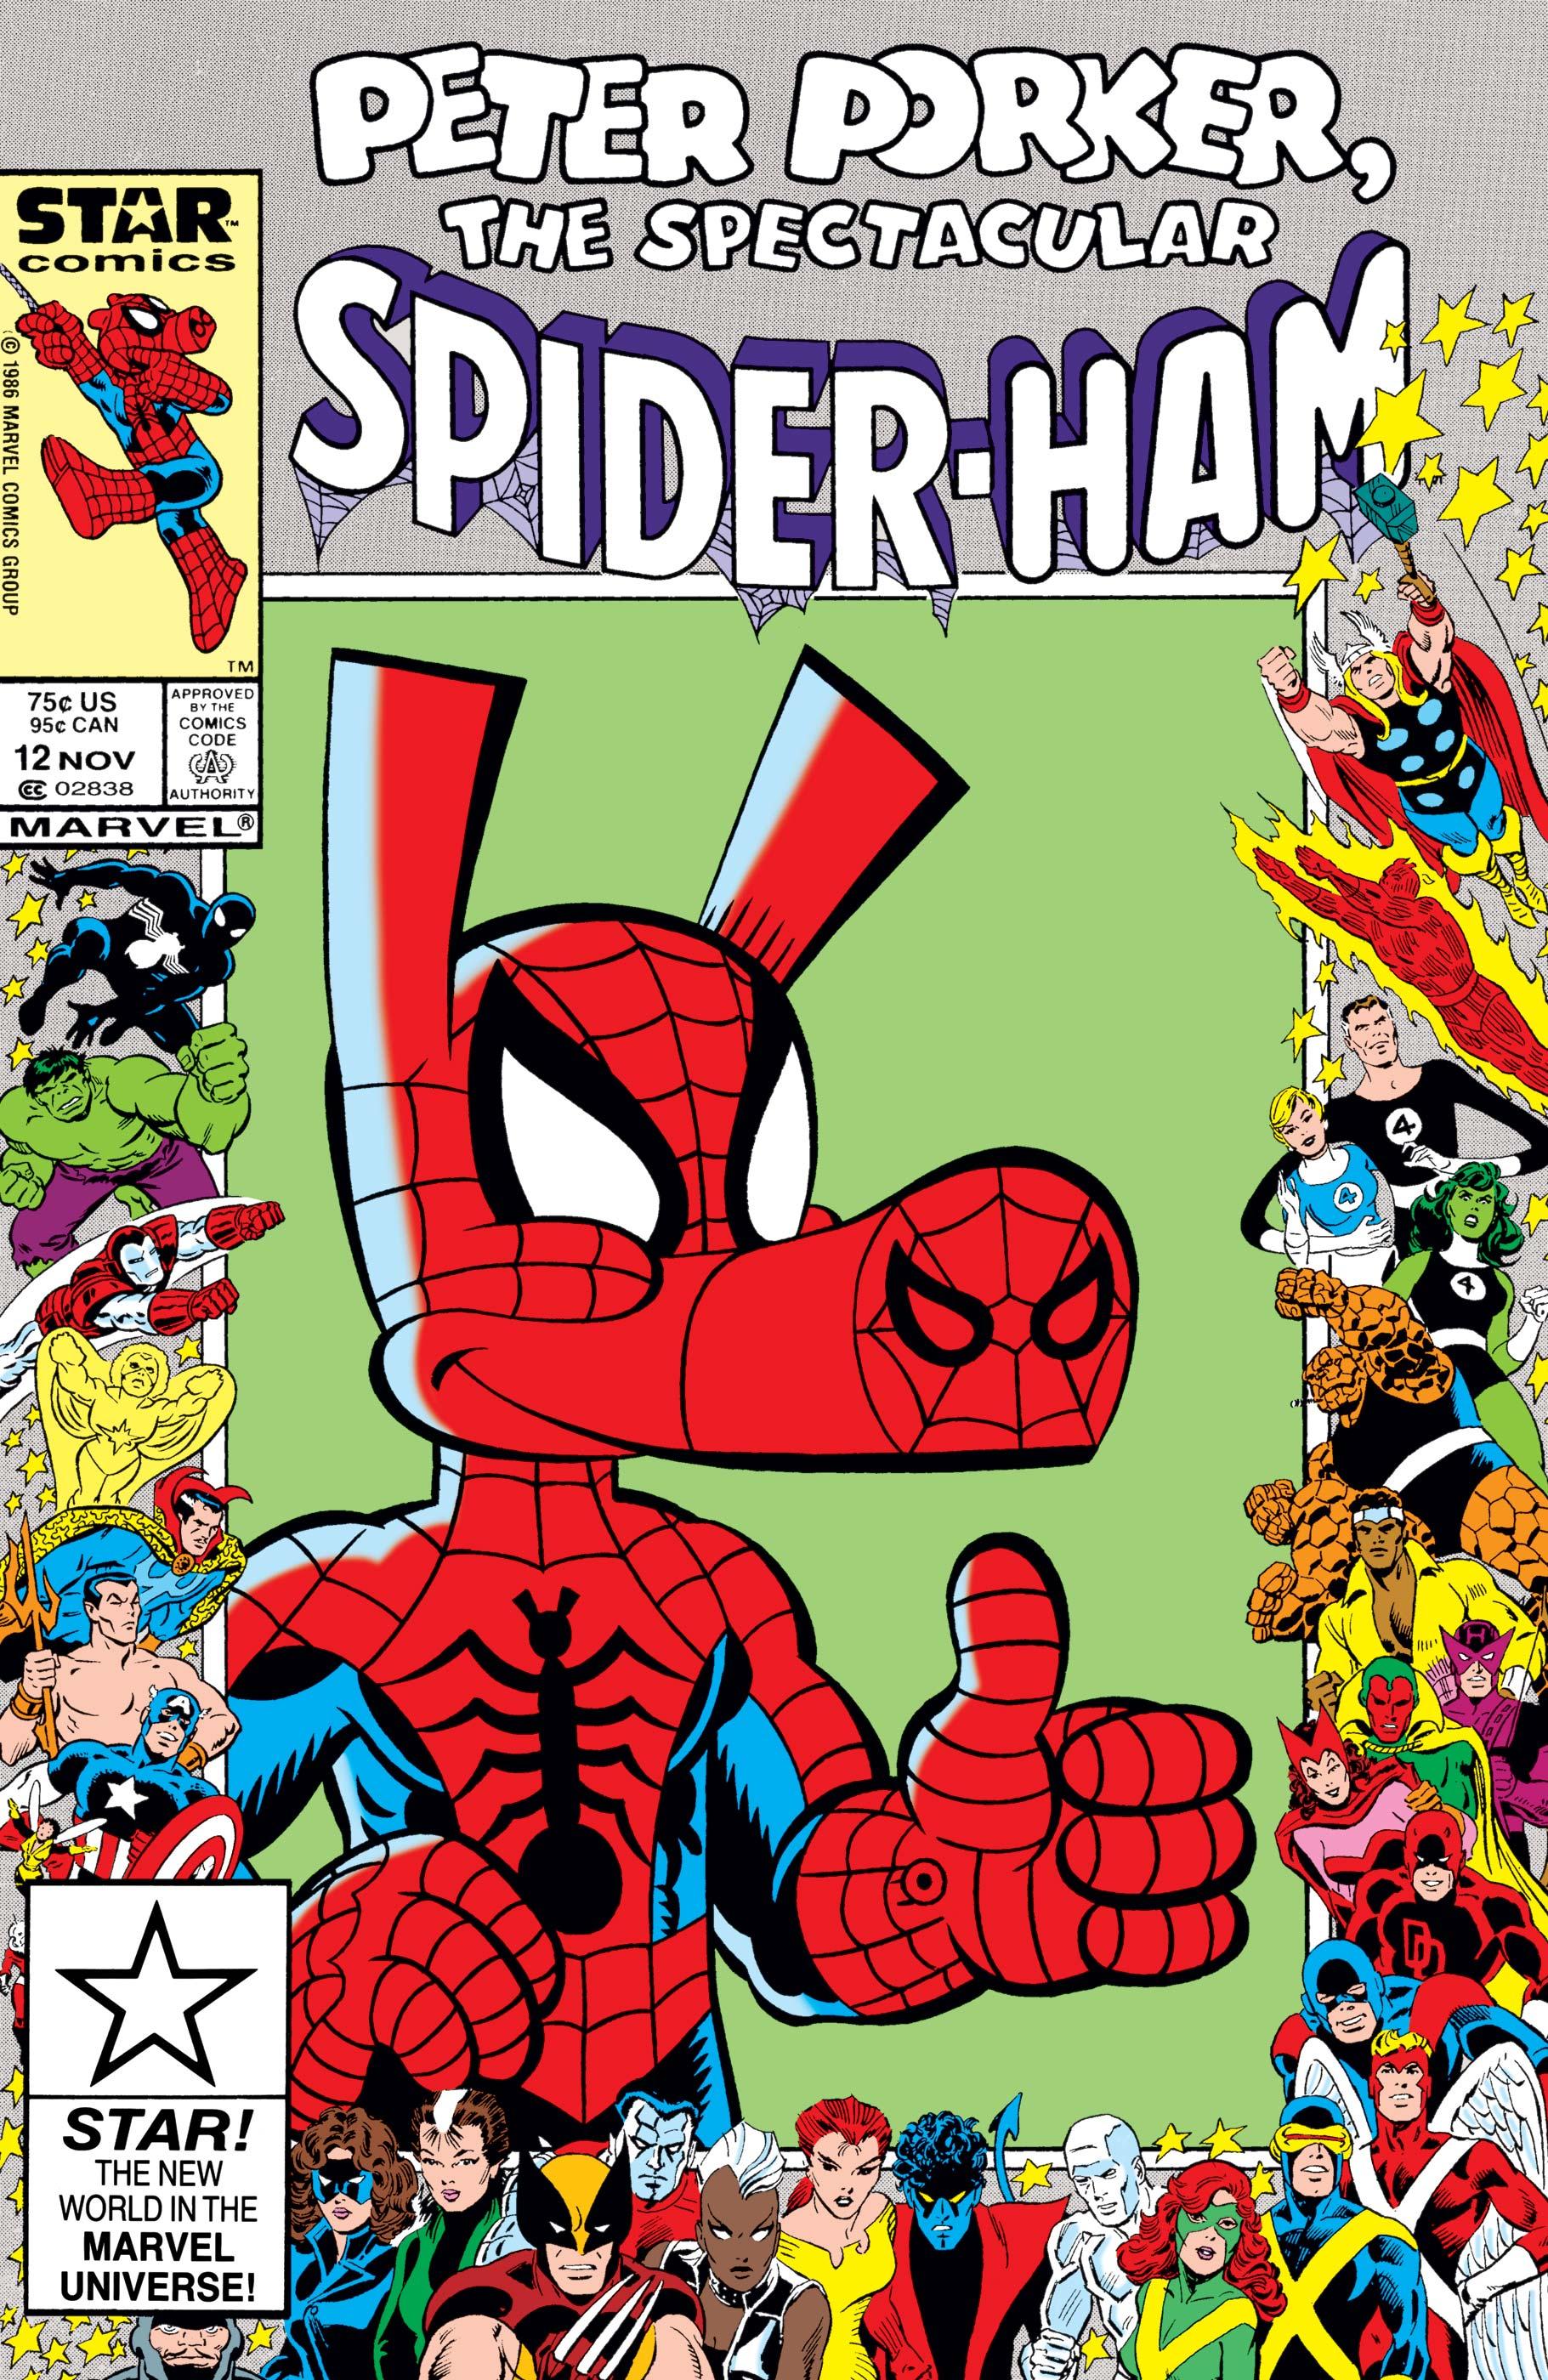 Peter Porker, the Spectacular Spider-Ham (1985) #12